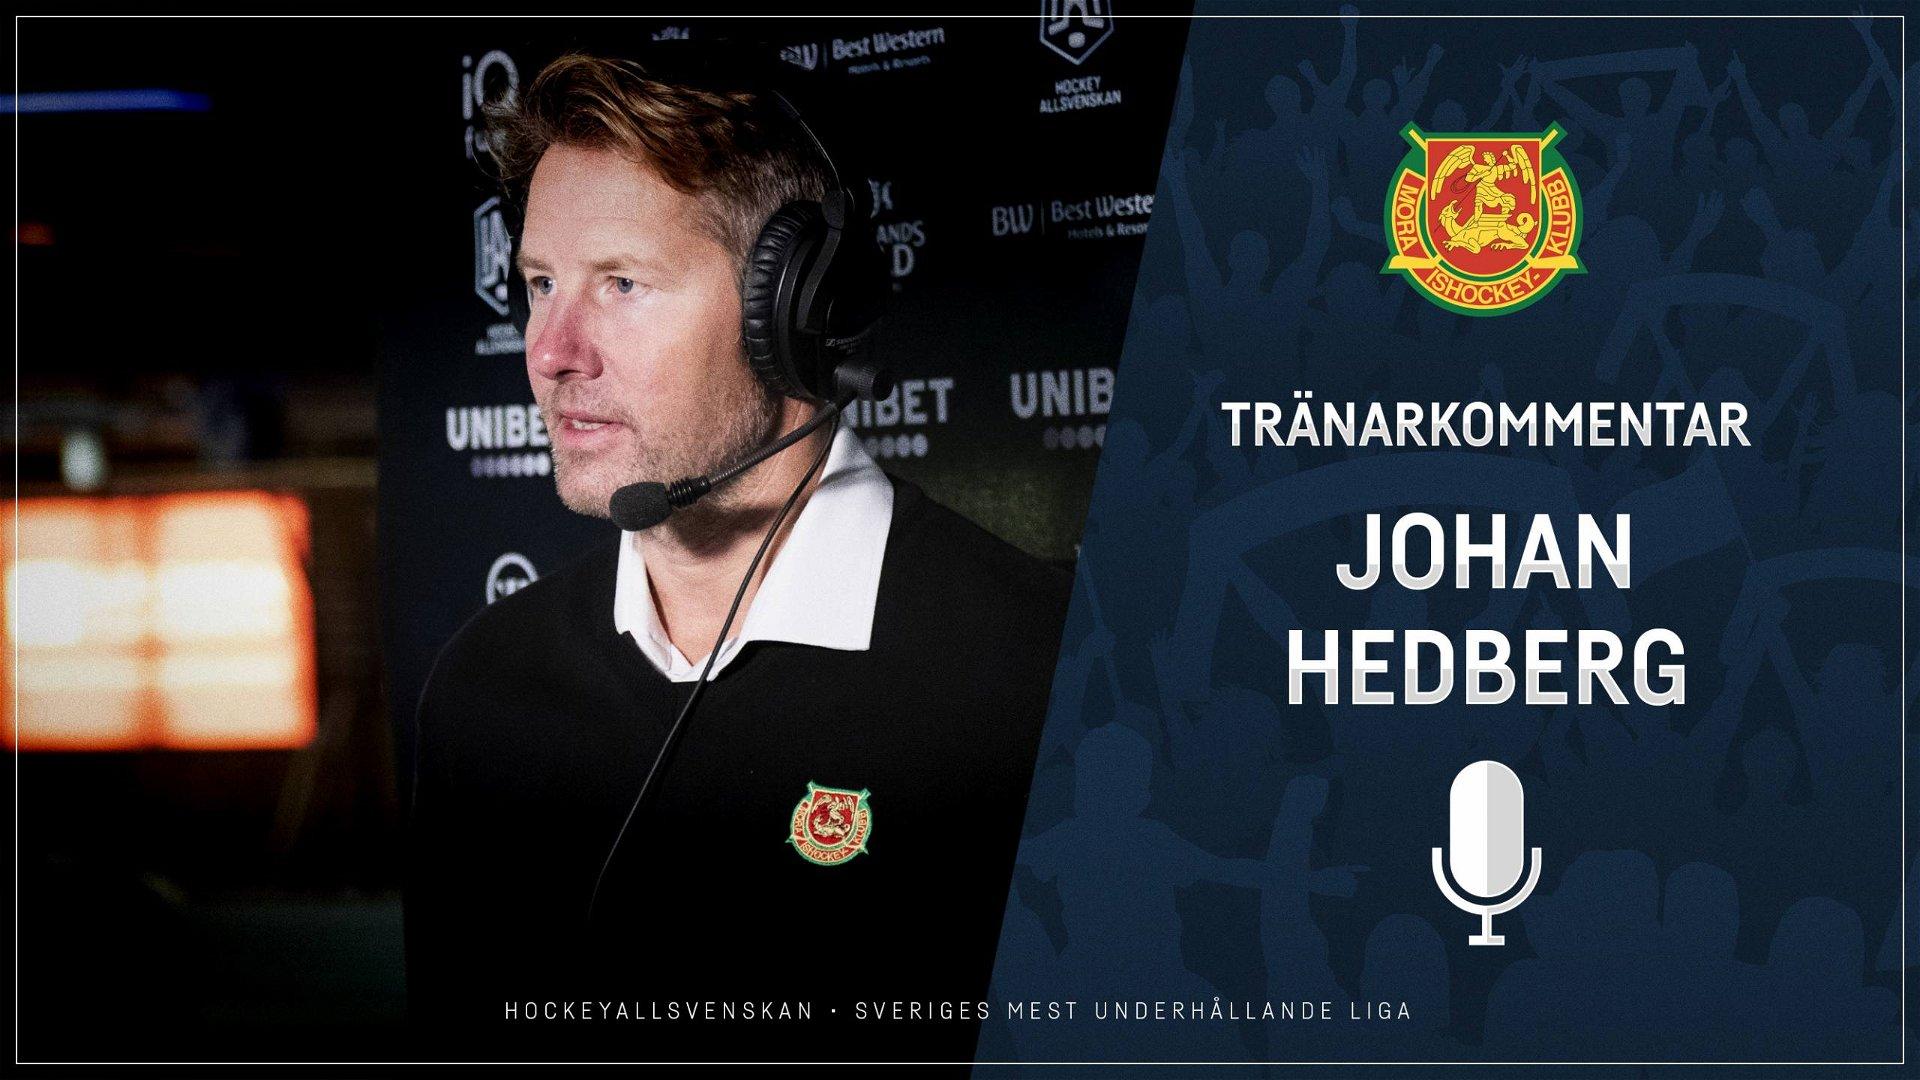 2021-02-07 Segerintervju: Johan Hedberg